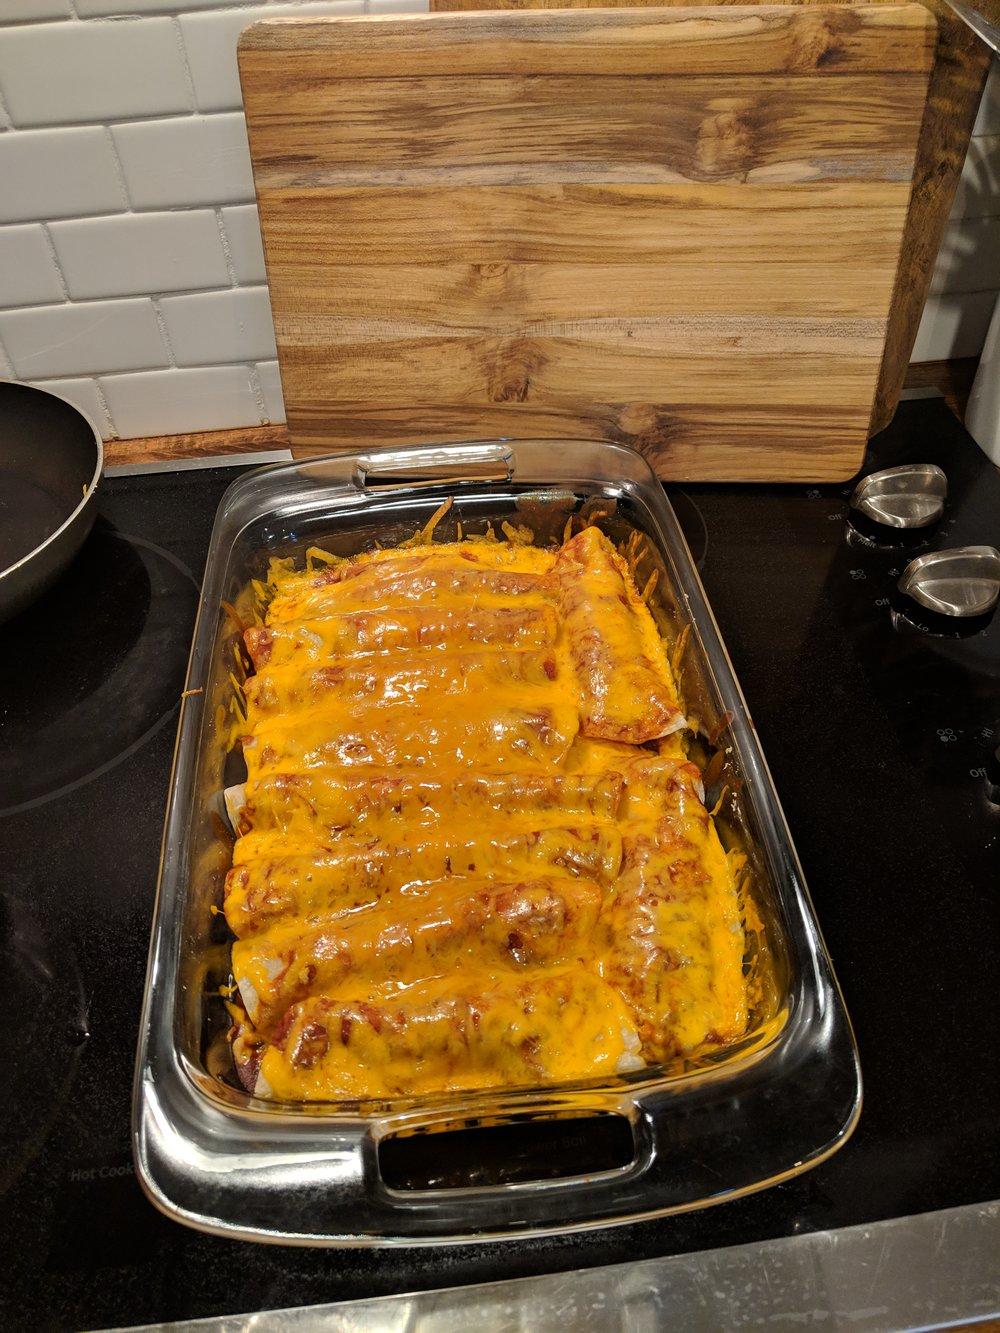 Tori Bryan/Enchiladas